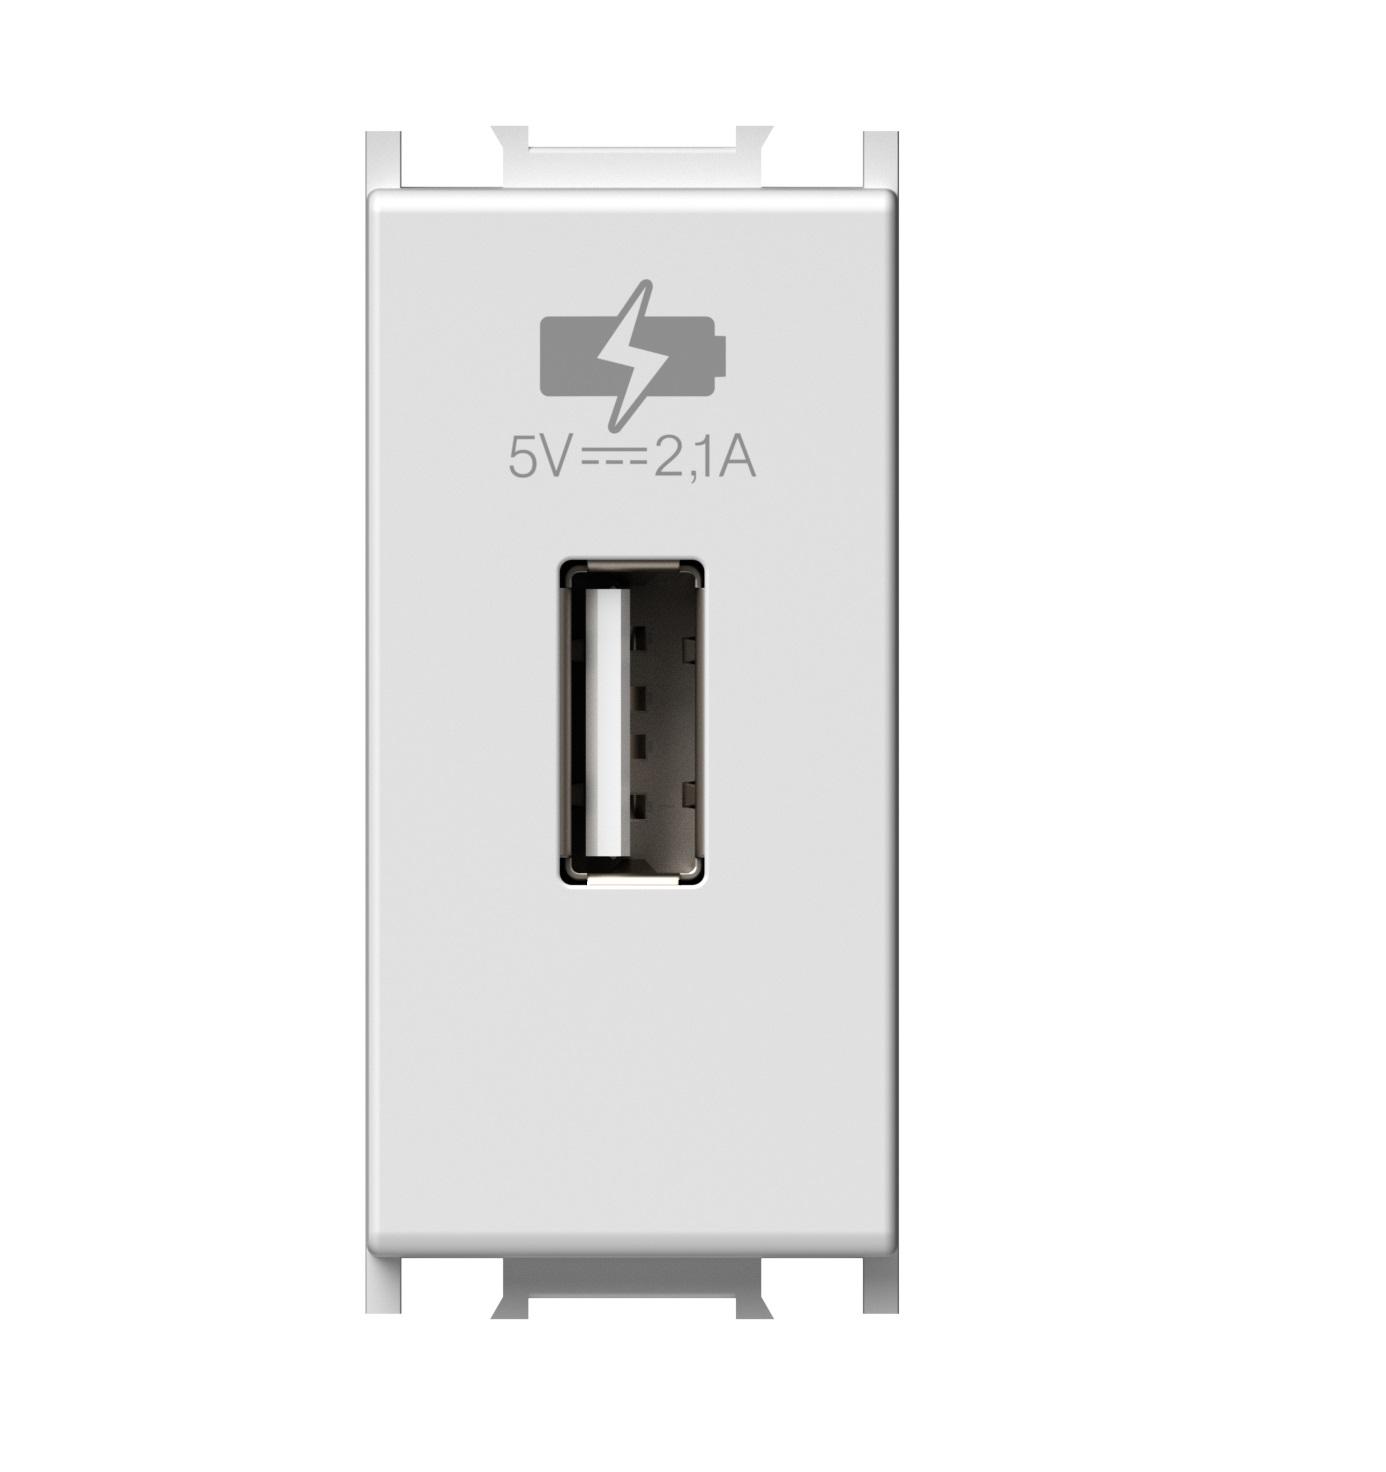 1 Stk USB Ladesteckdose, 5V, 2,1A, 1M, weiß ET101016--